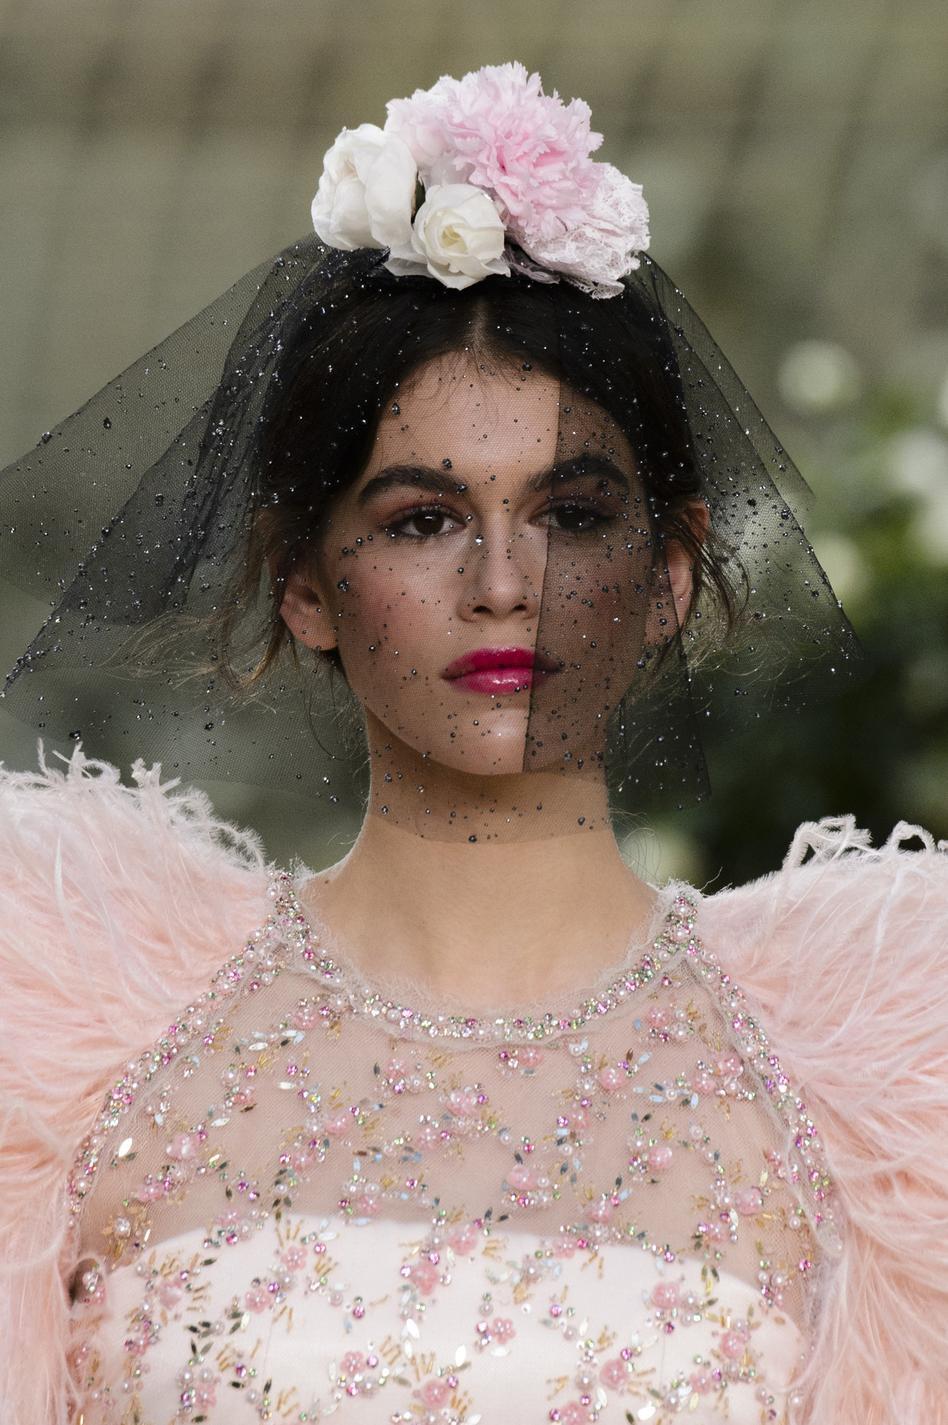 Chanel dior ralph russo la voilette envo te les for Chambre de la haute couture